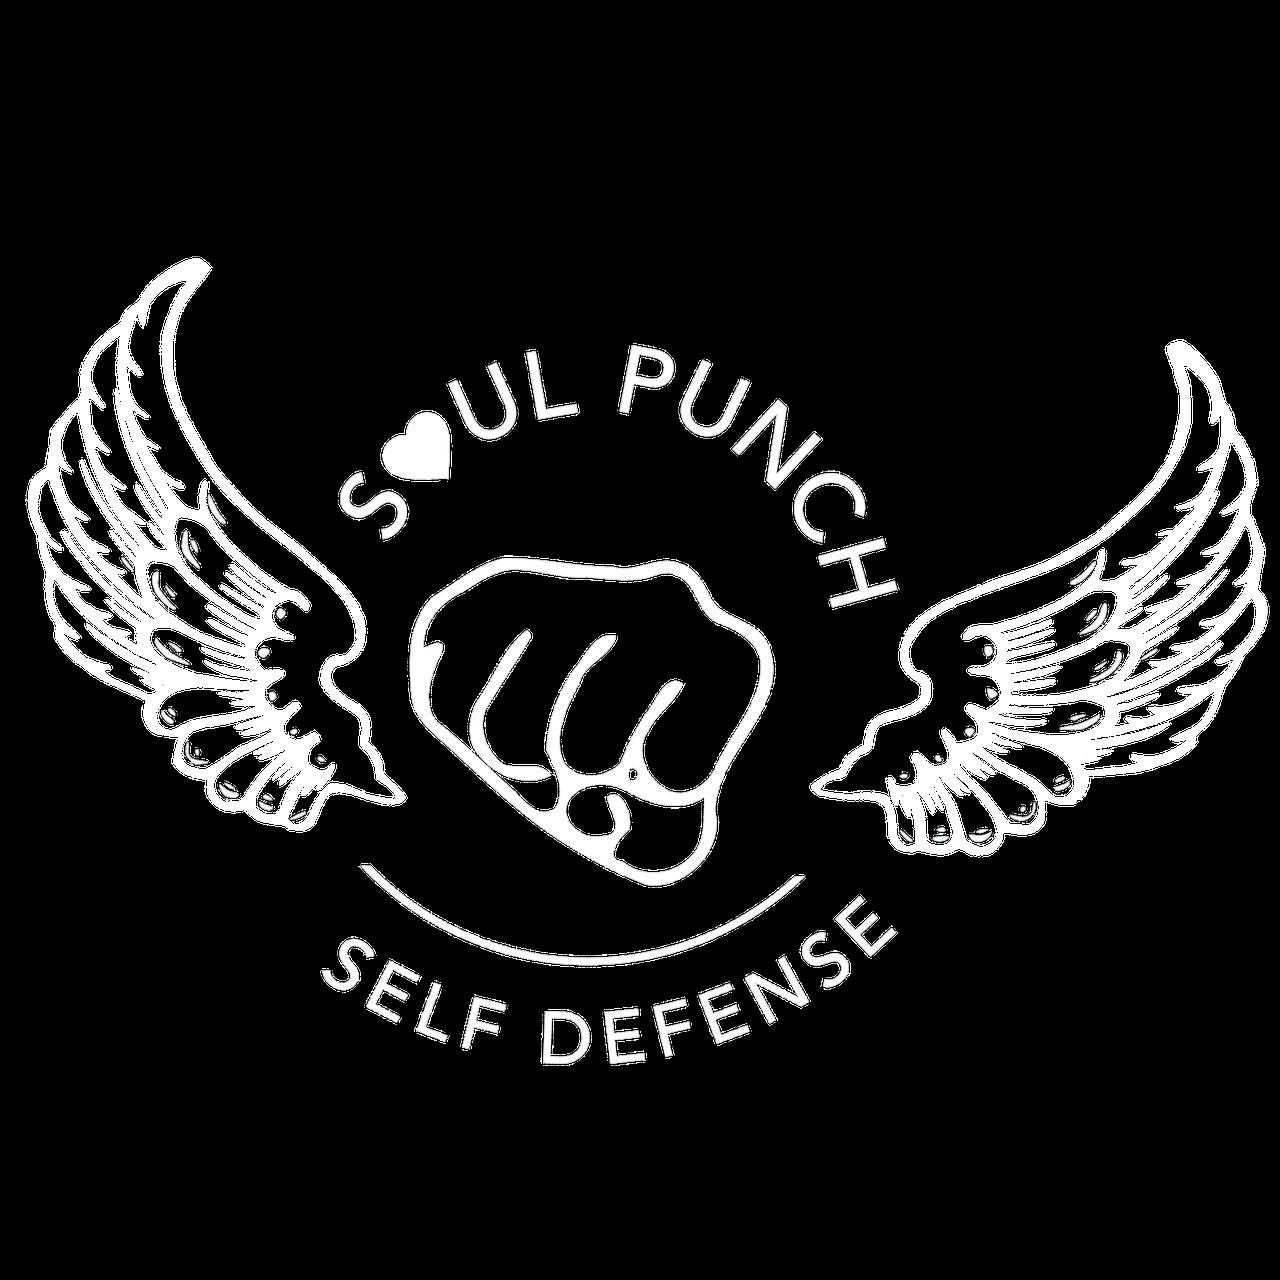 self defense for women